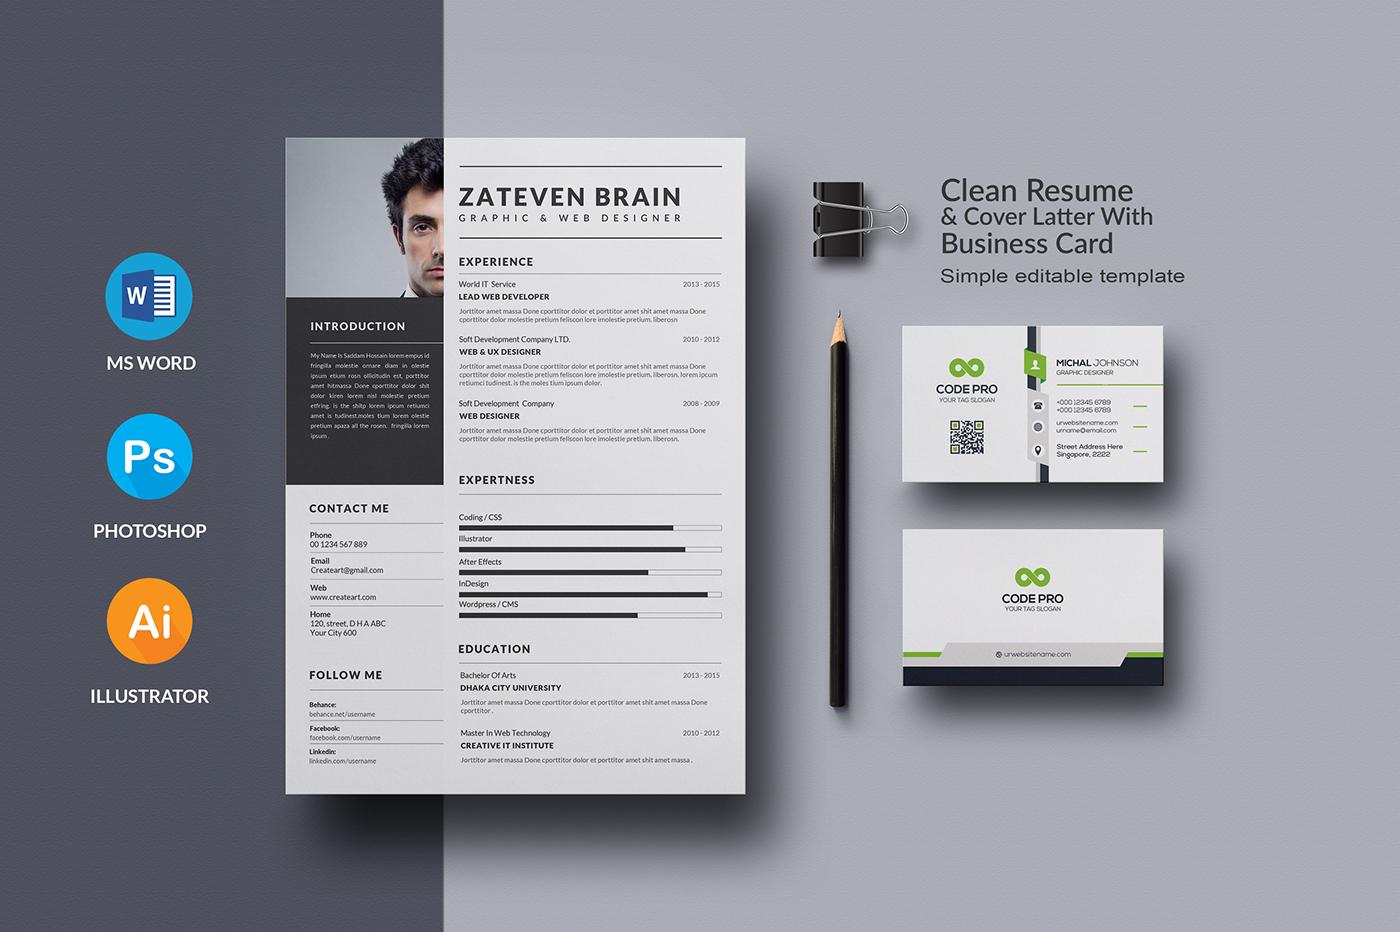 Behance | Creative Market I Dribbble